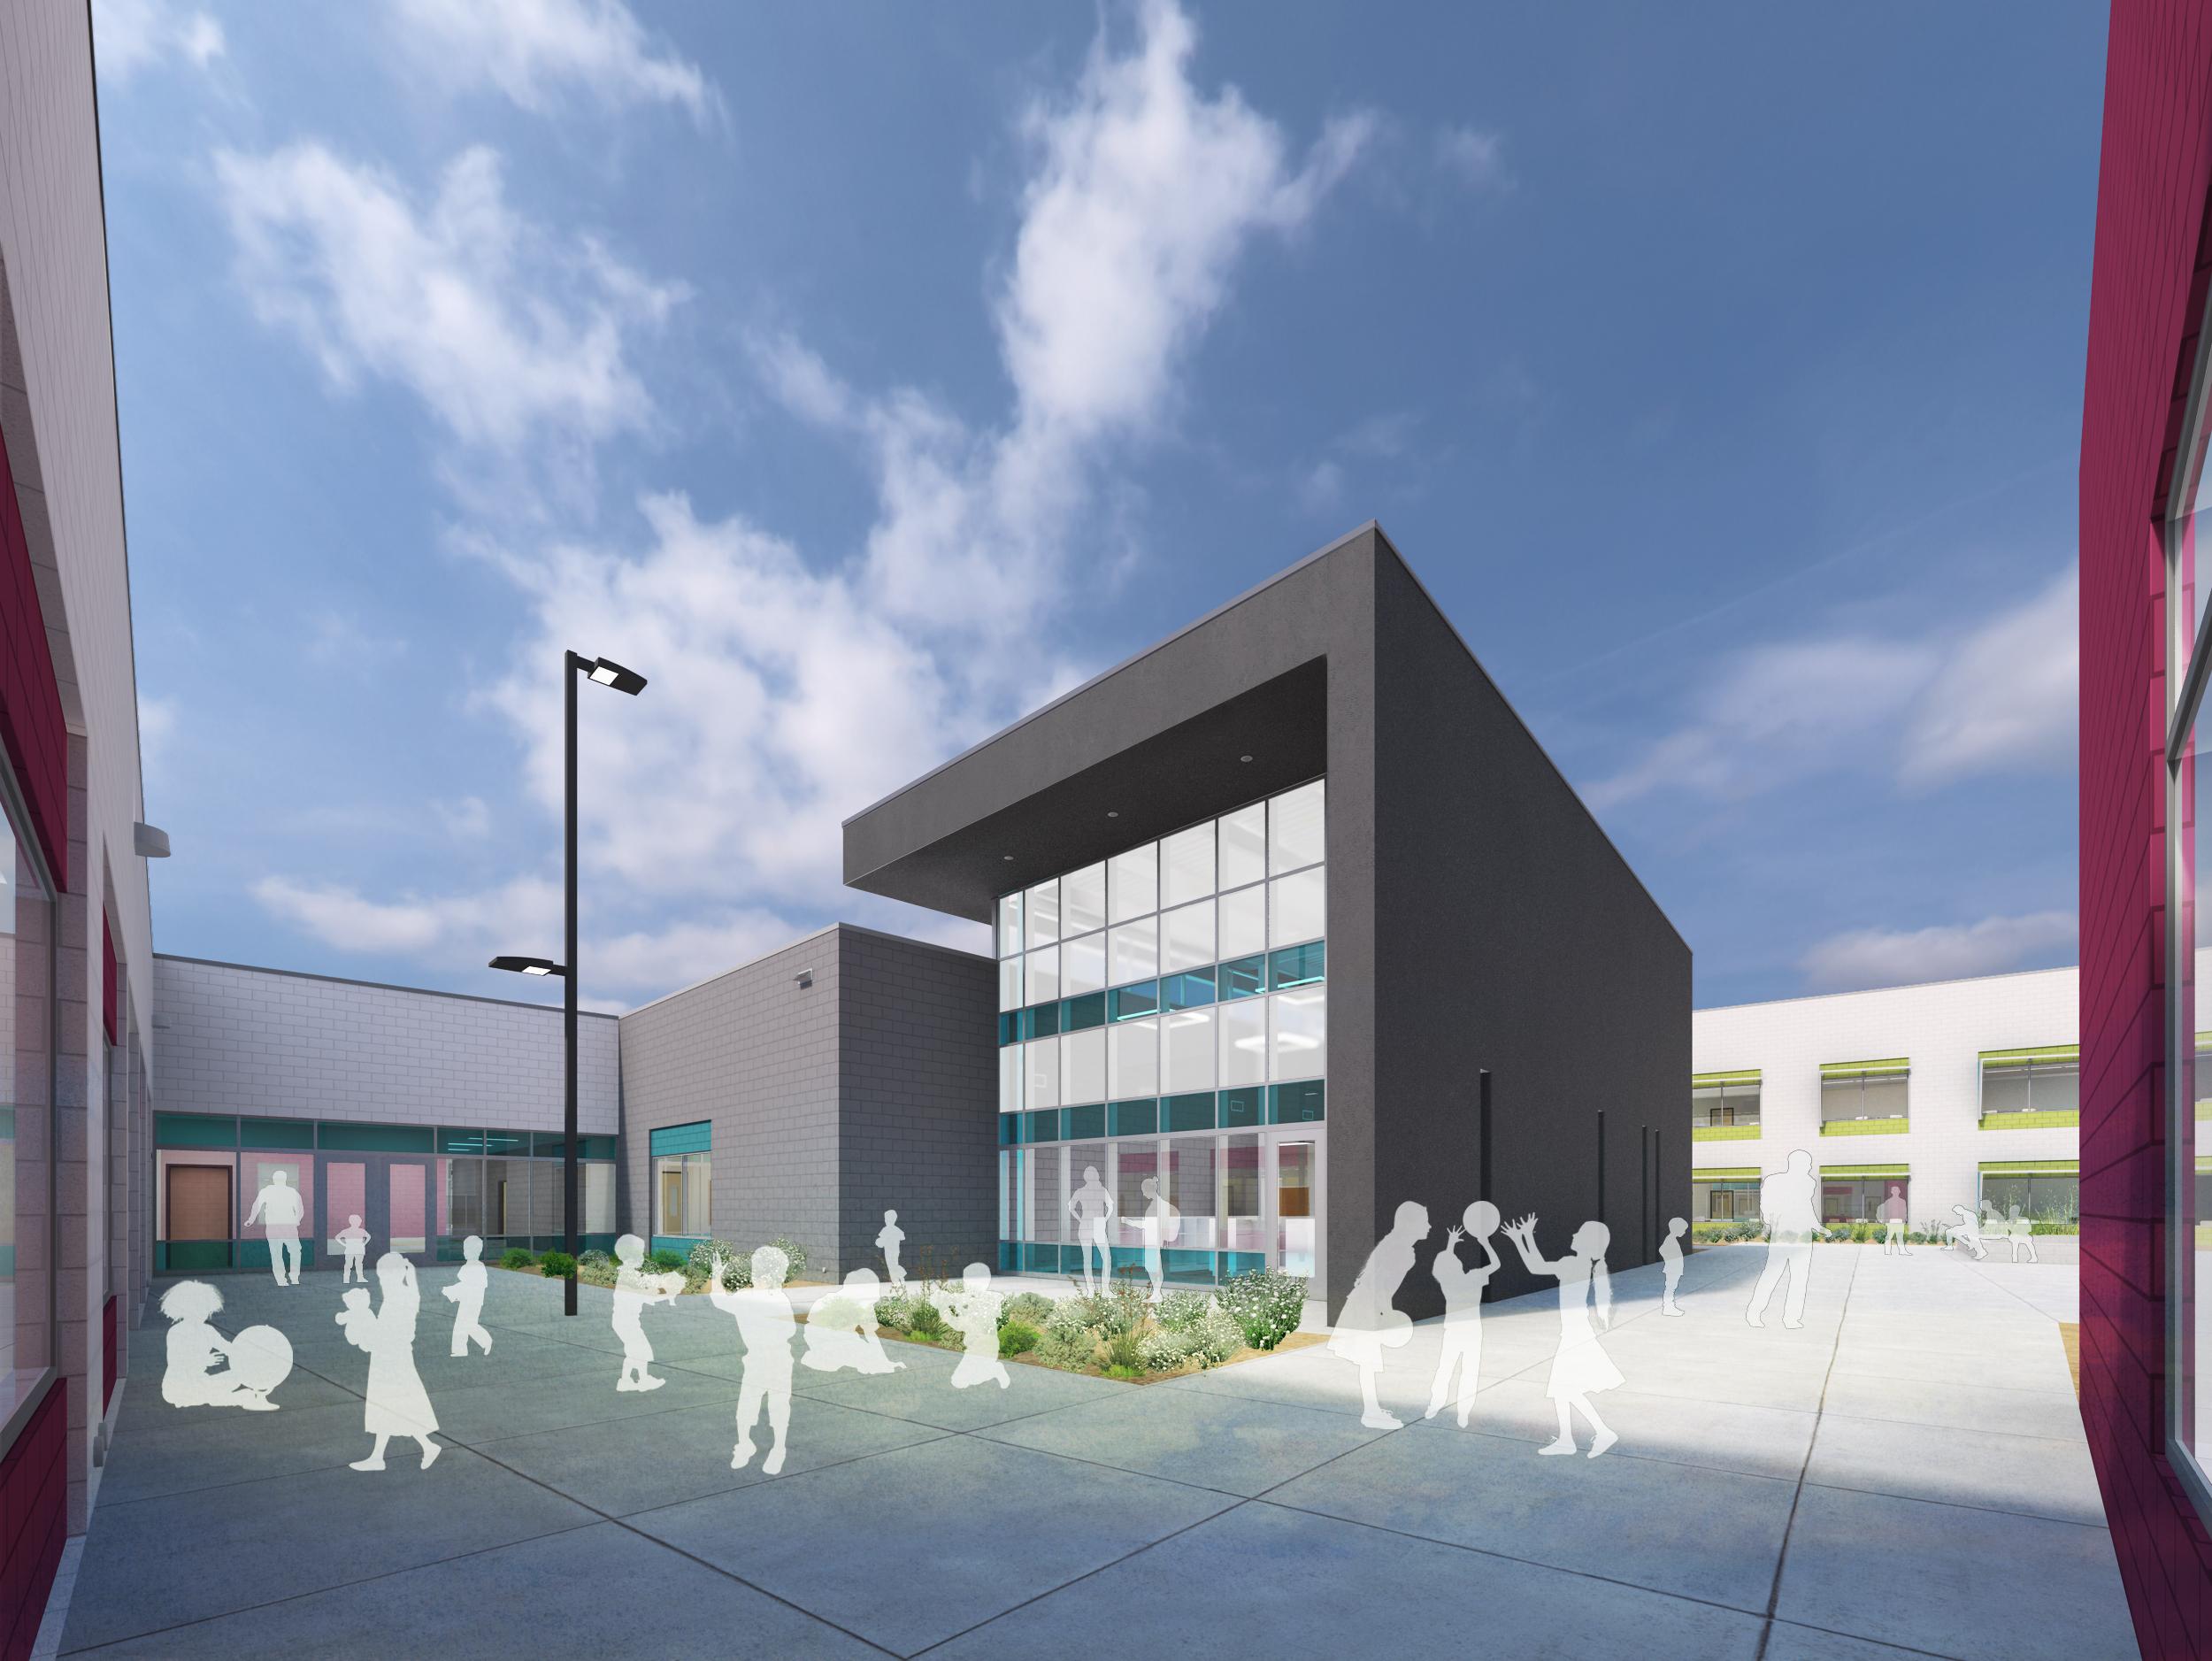 Lincoln Elementary School Exterior Rendering